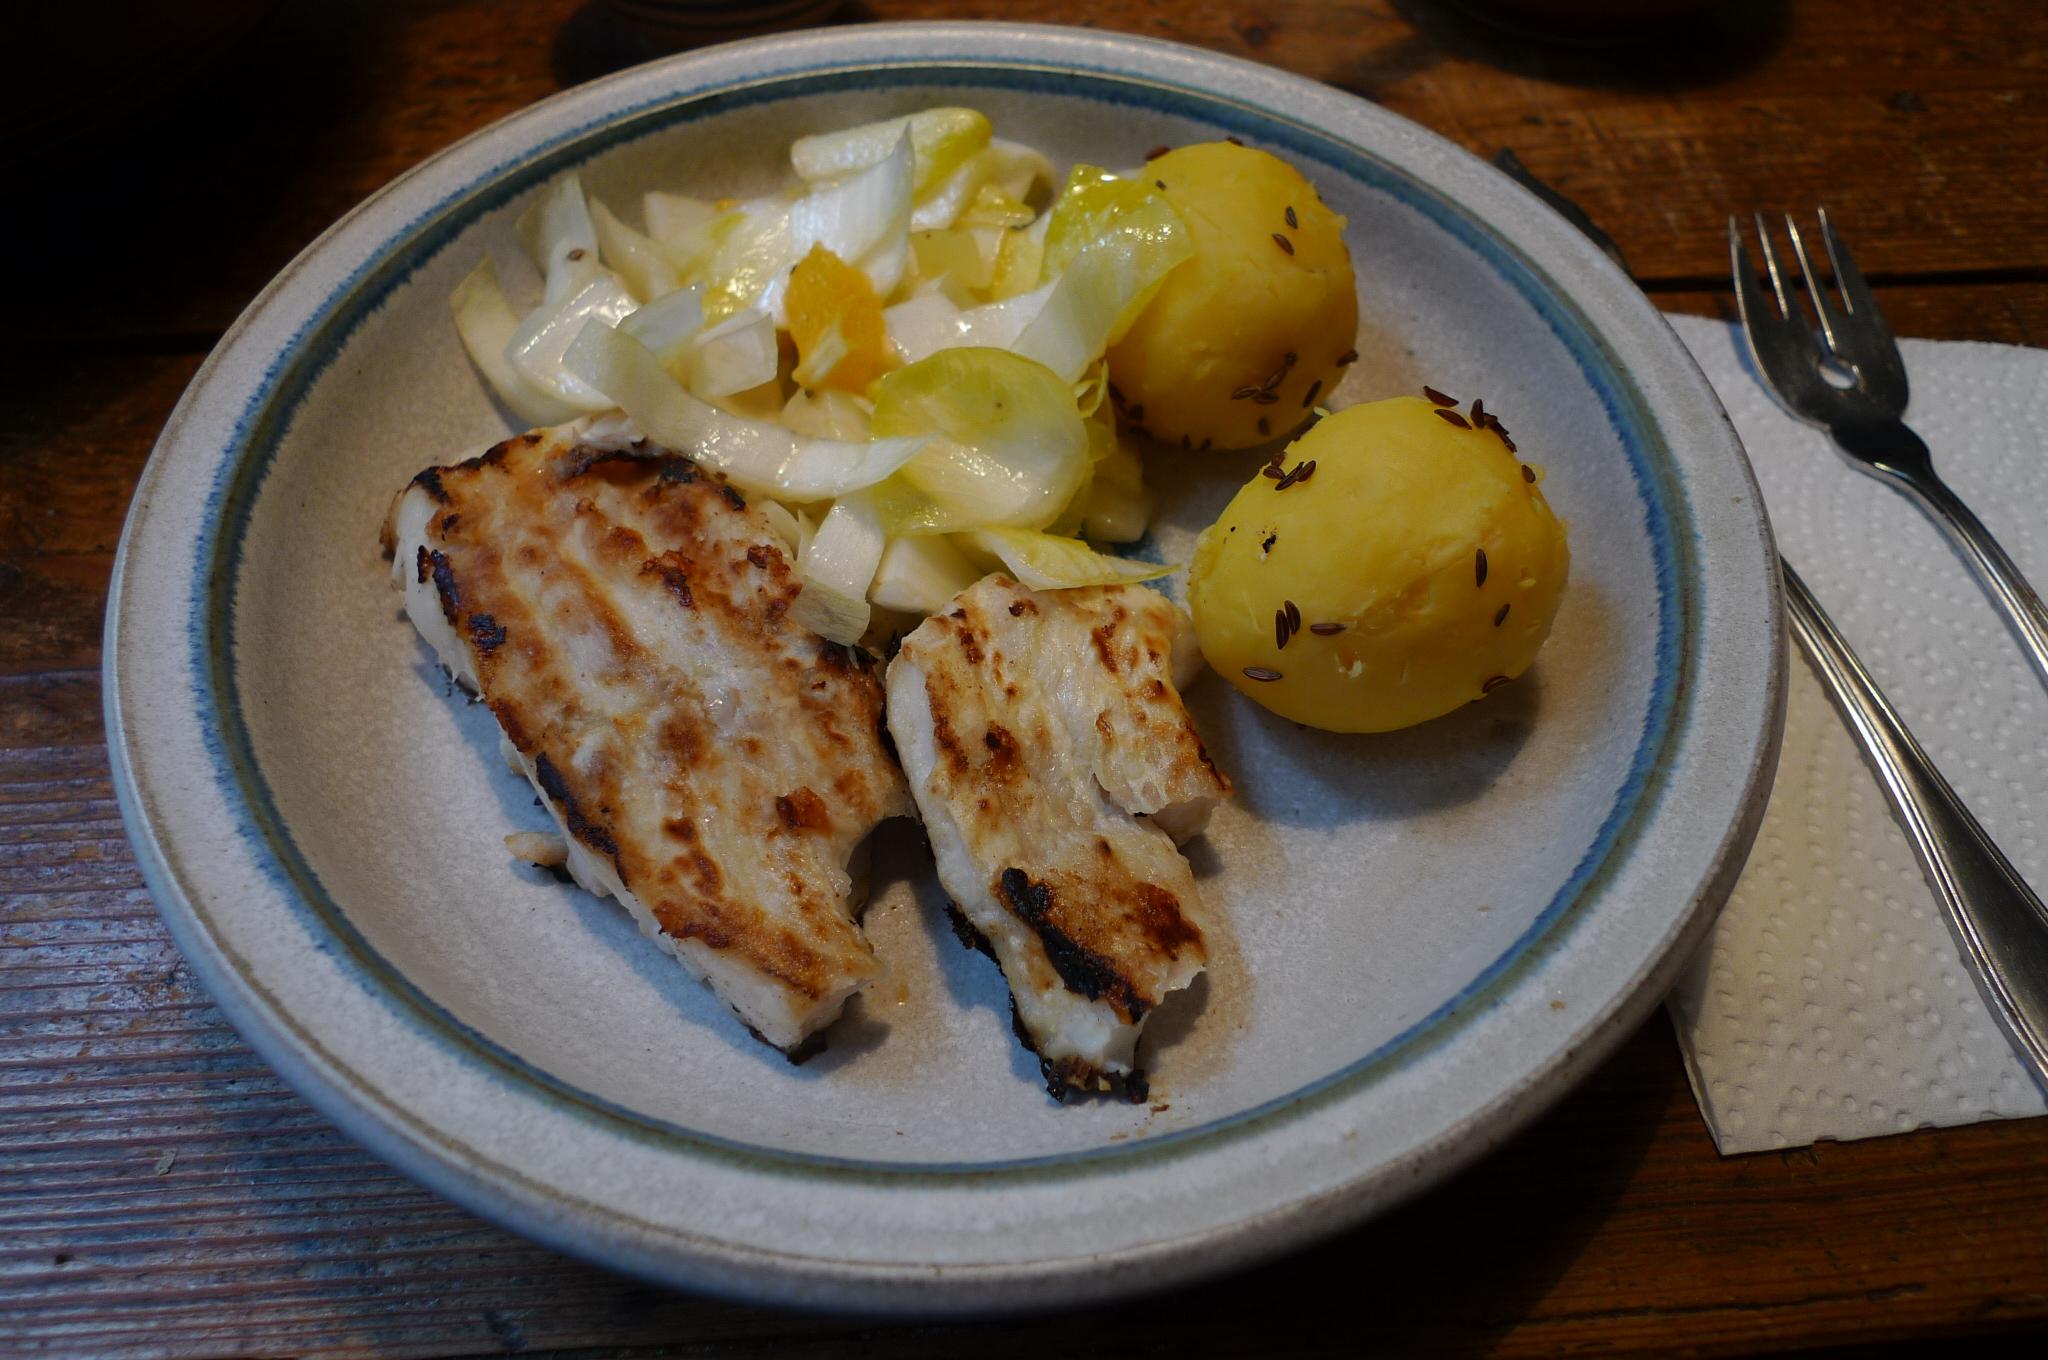 Kabeljau,Chicoreesalat,Kartoffeln,Quarkspeise - 17.2.15   (1)